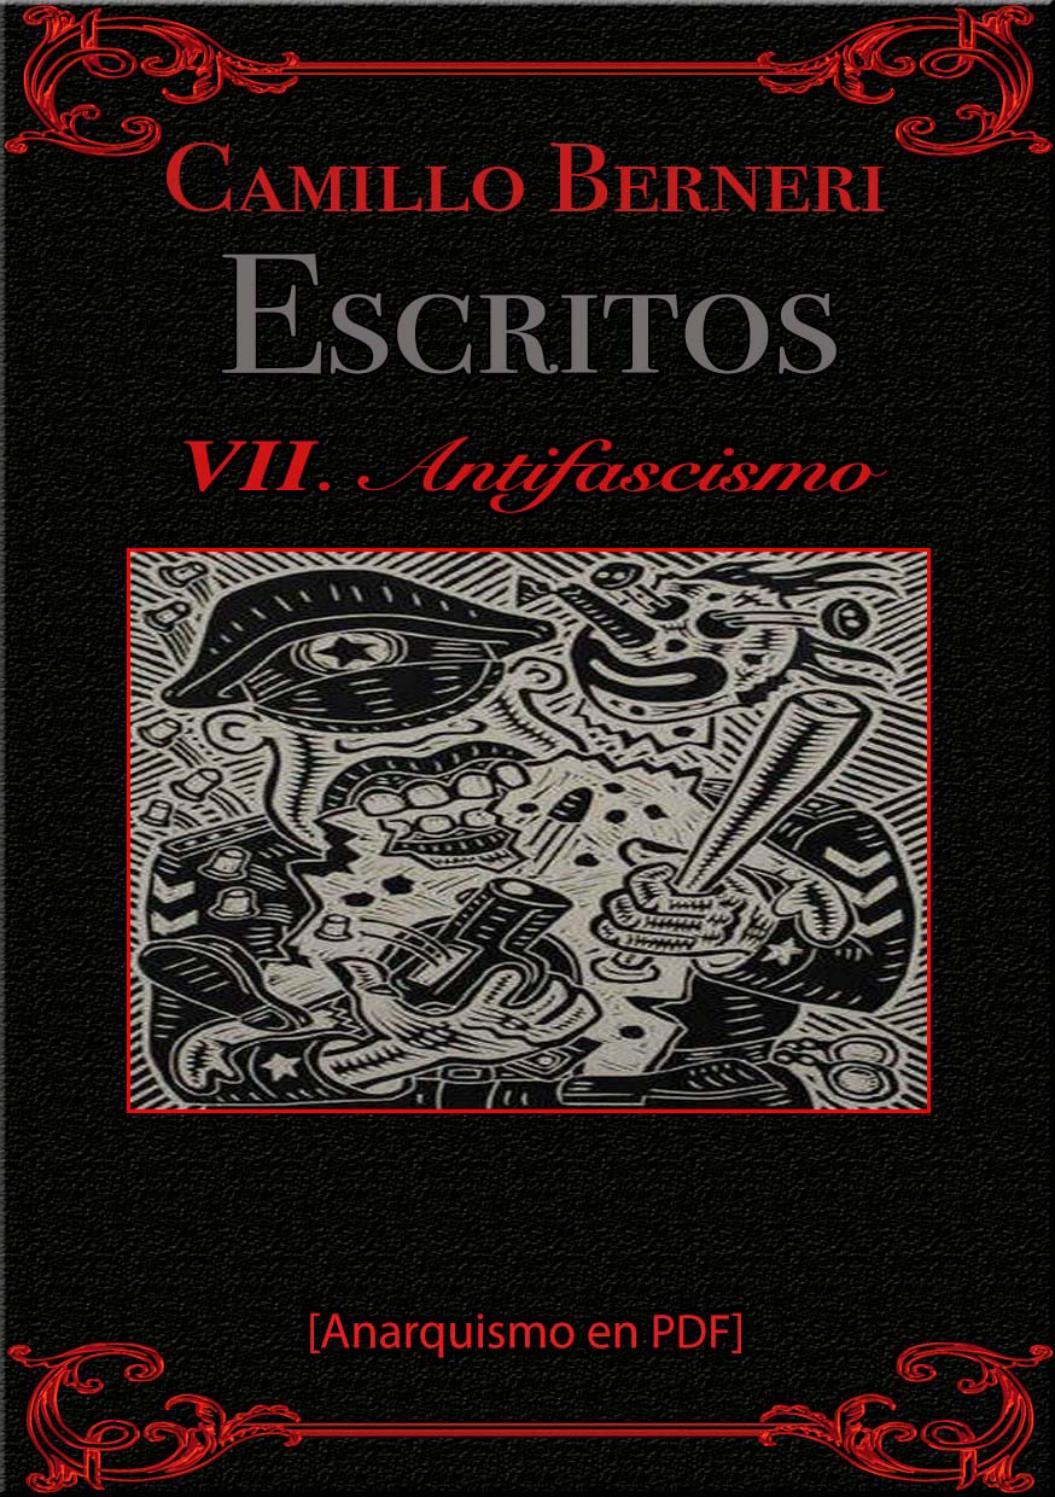 Anti fascista//protesta//España CNT//unificar sindicato//Anarquismo